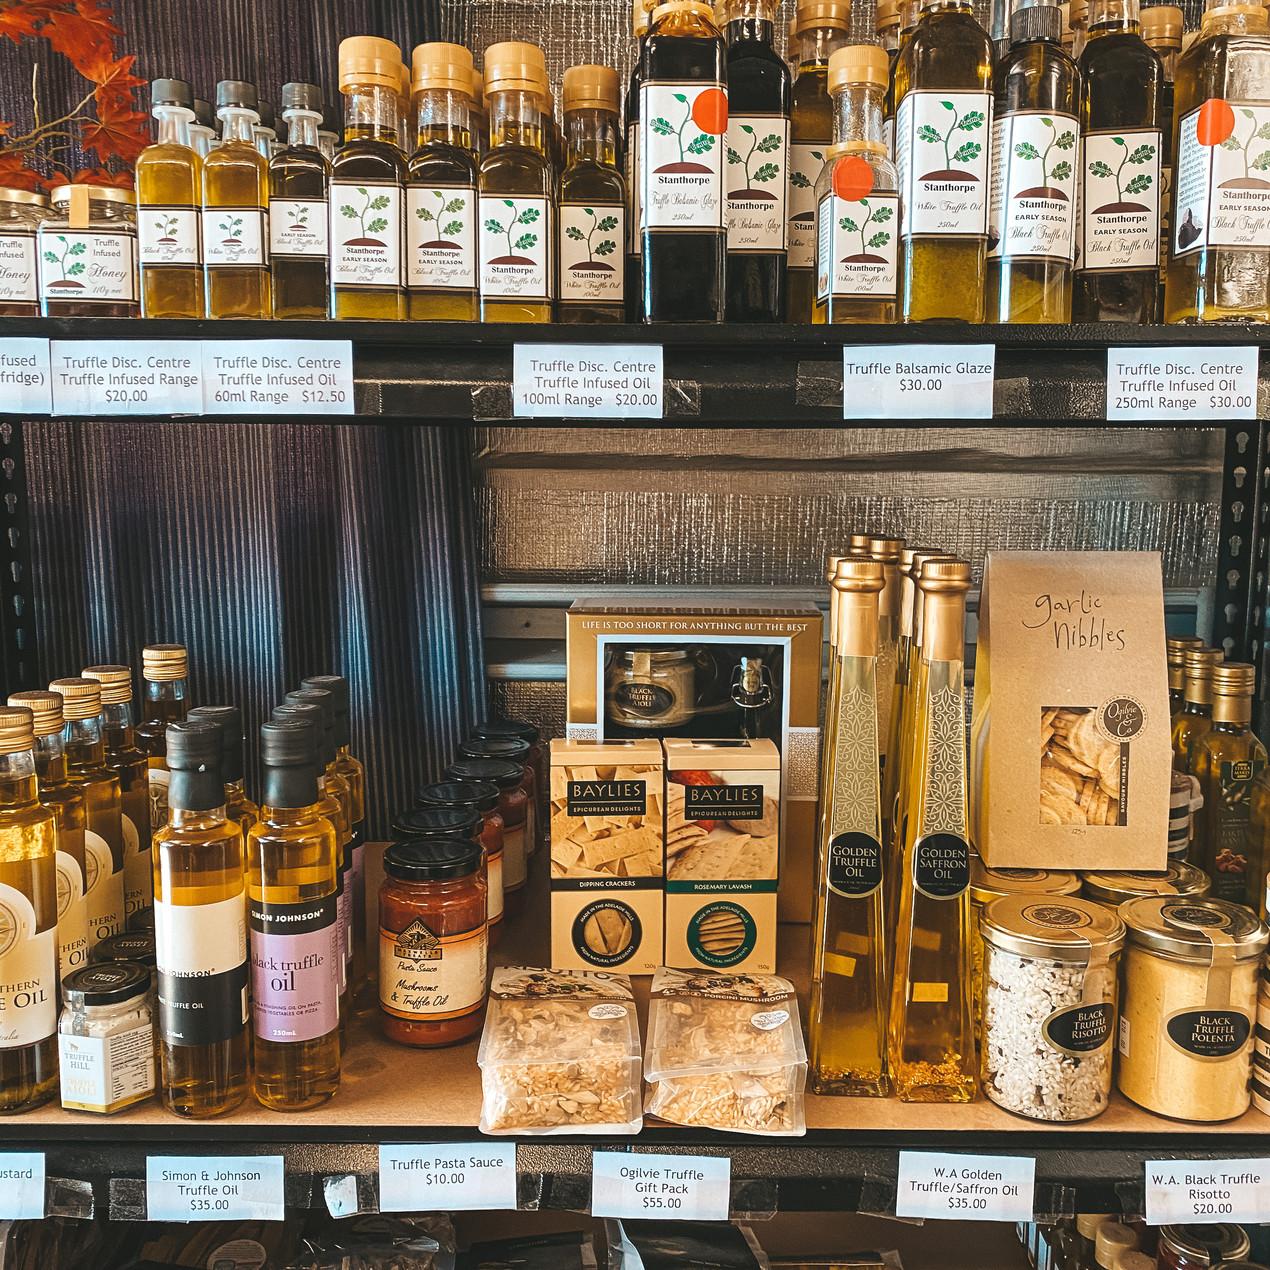 Stanthorpe truffle oils